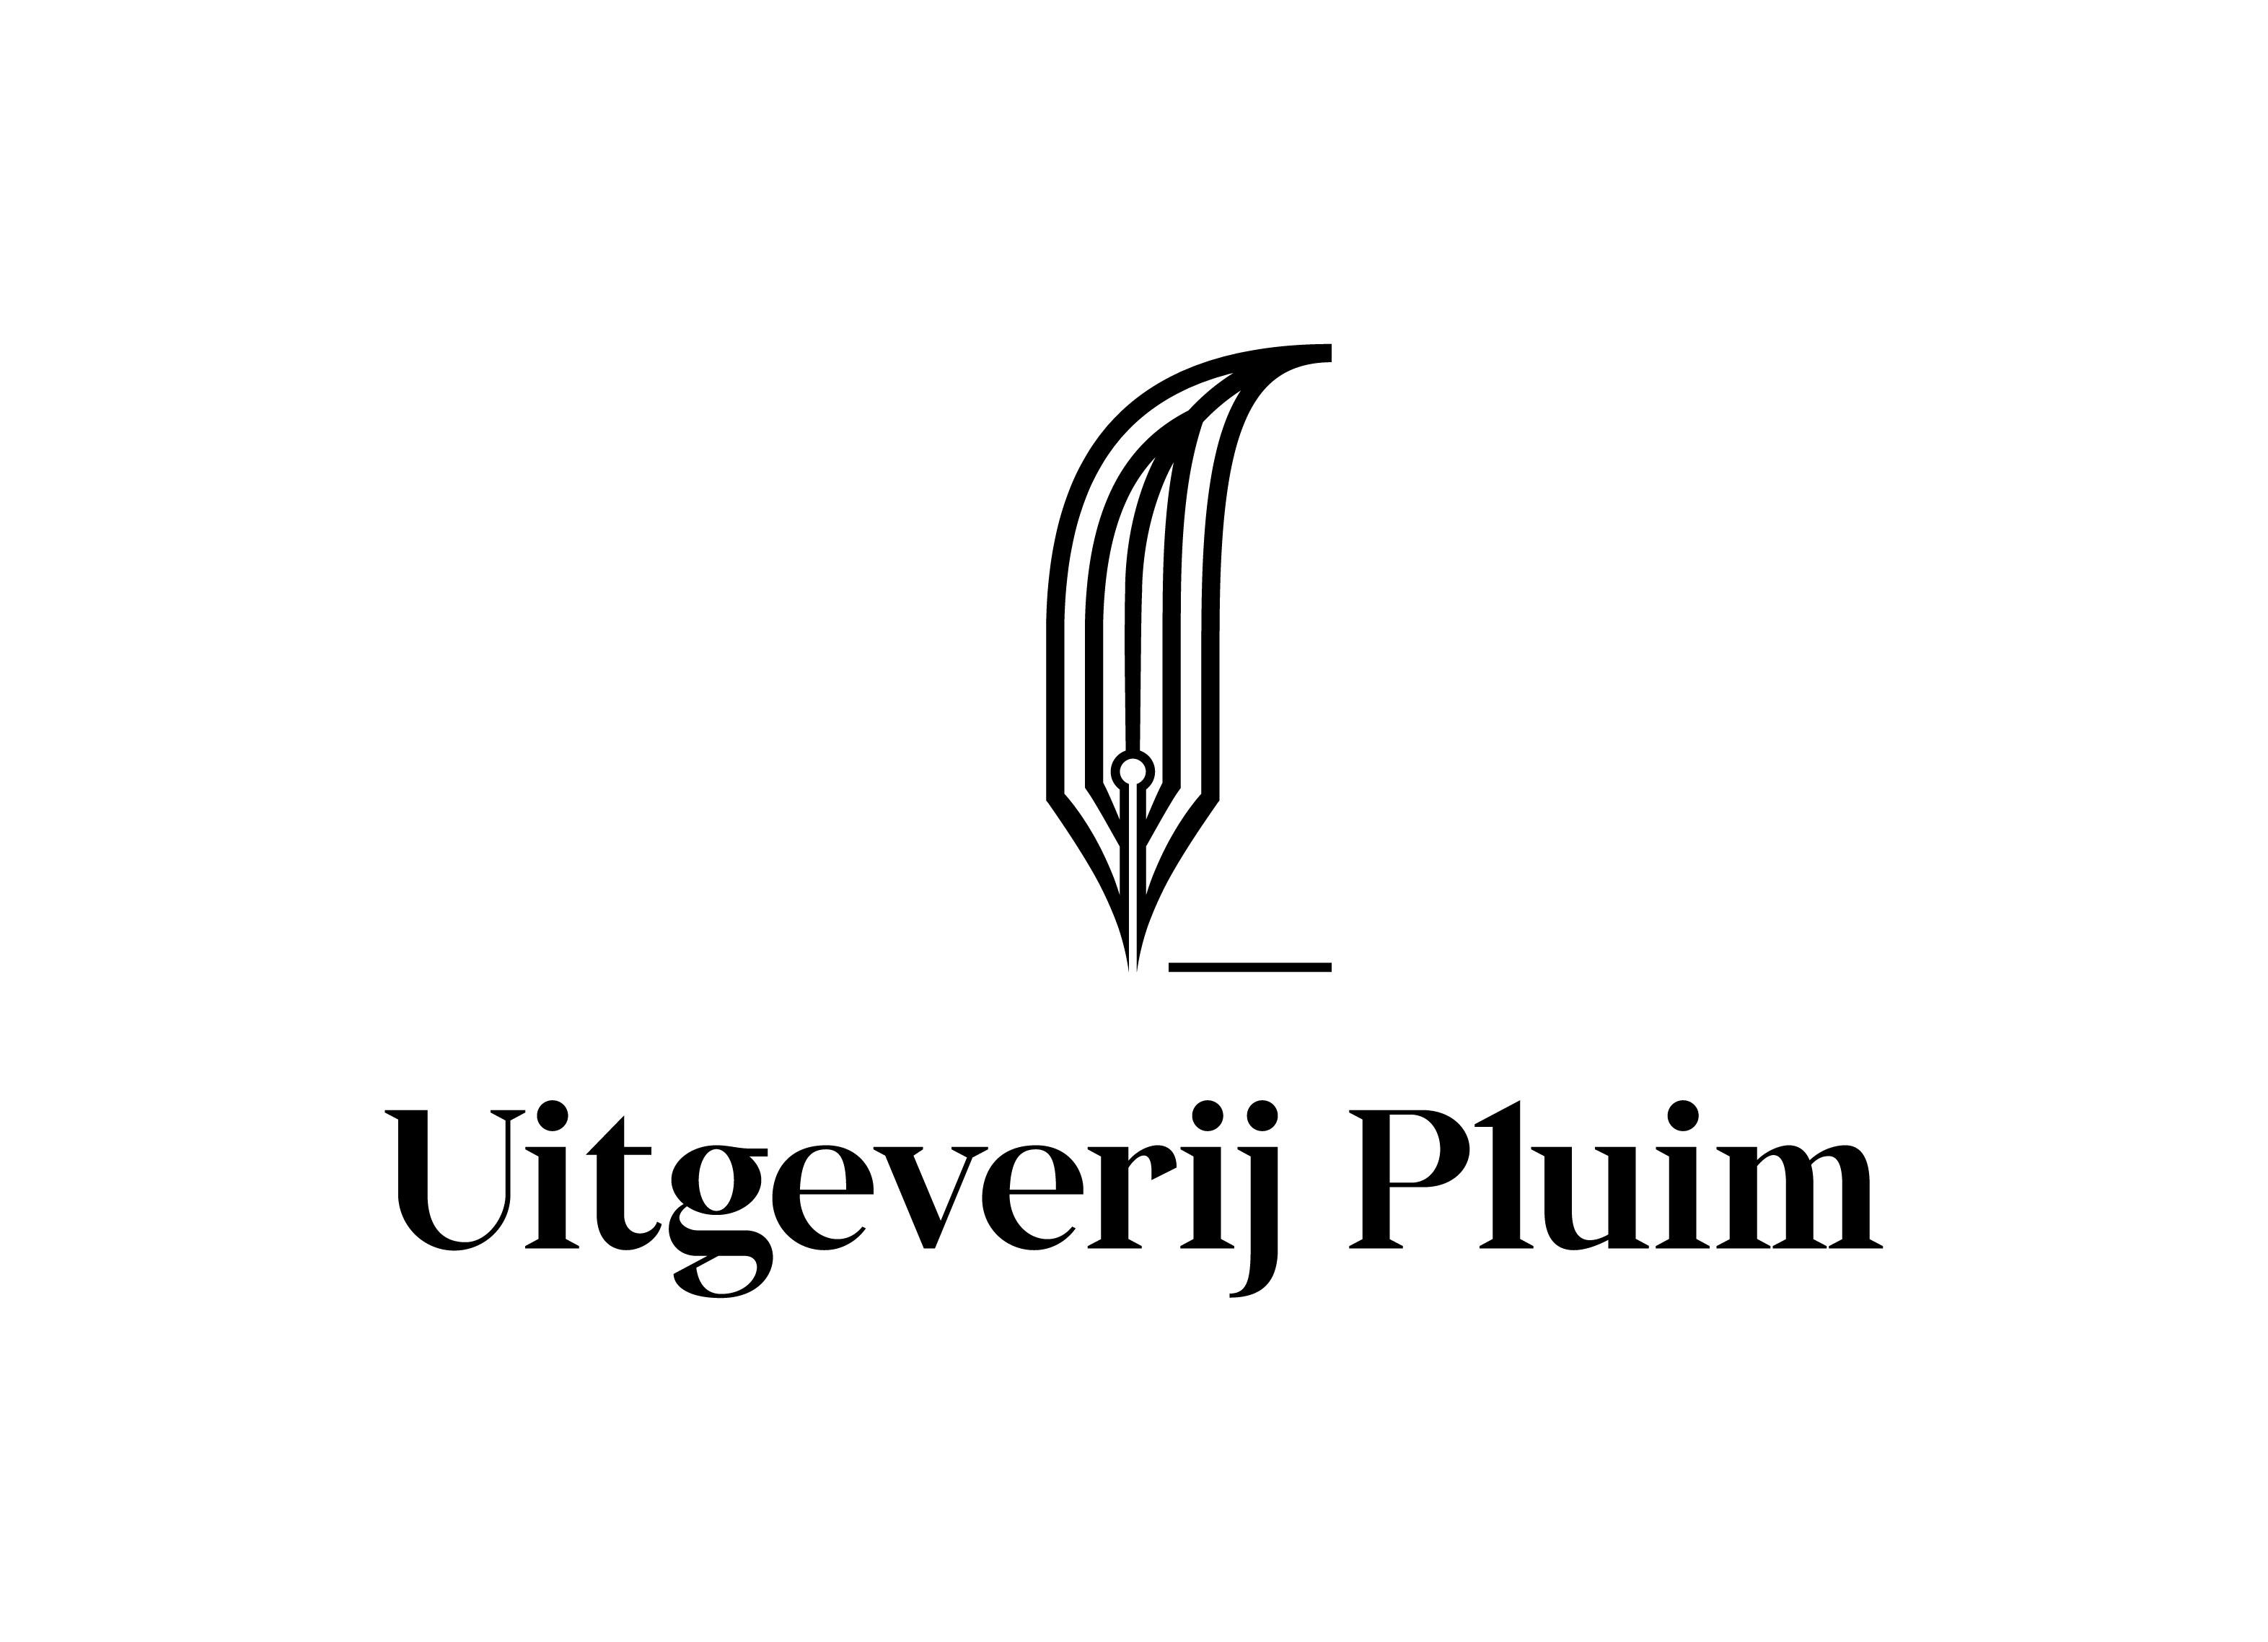 Uitgeverij Pluim